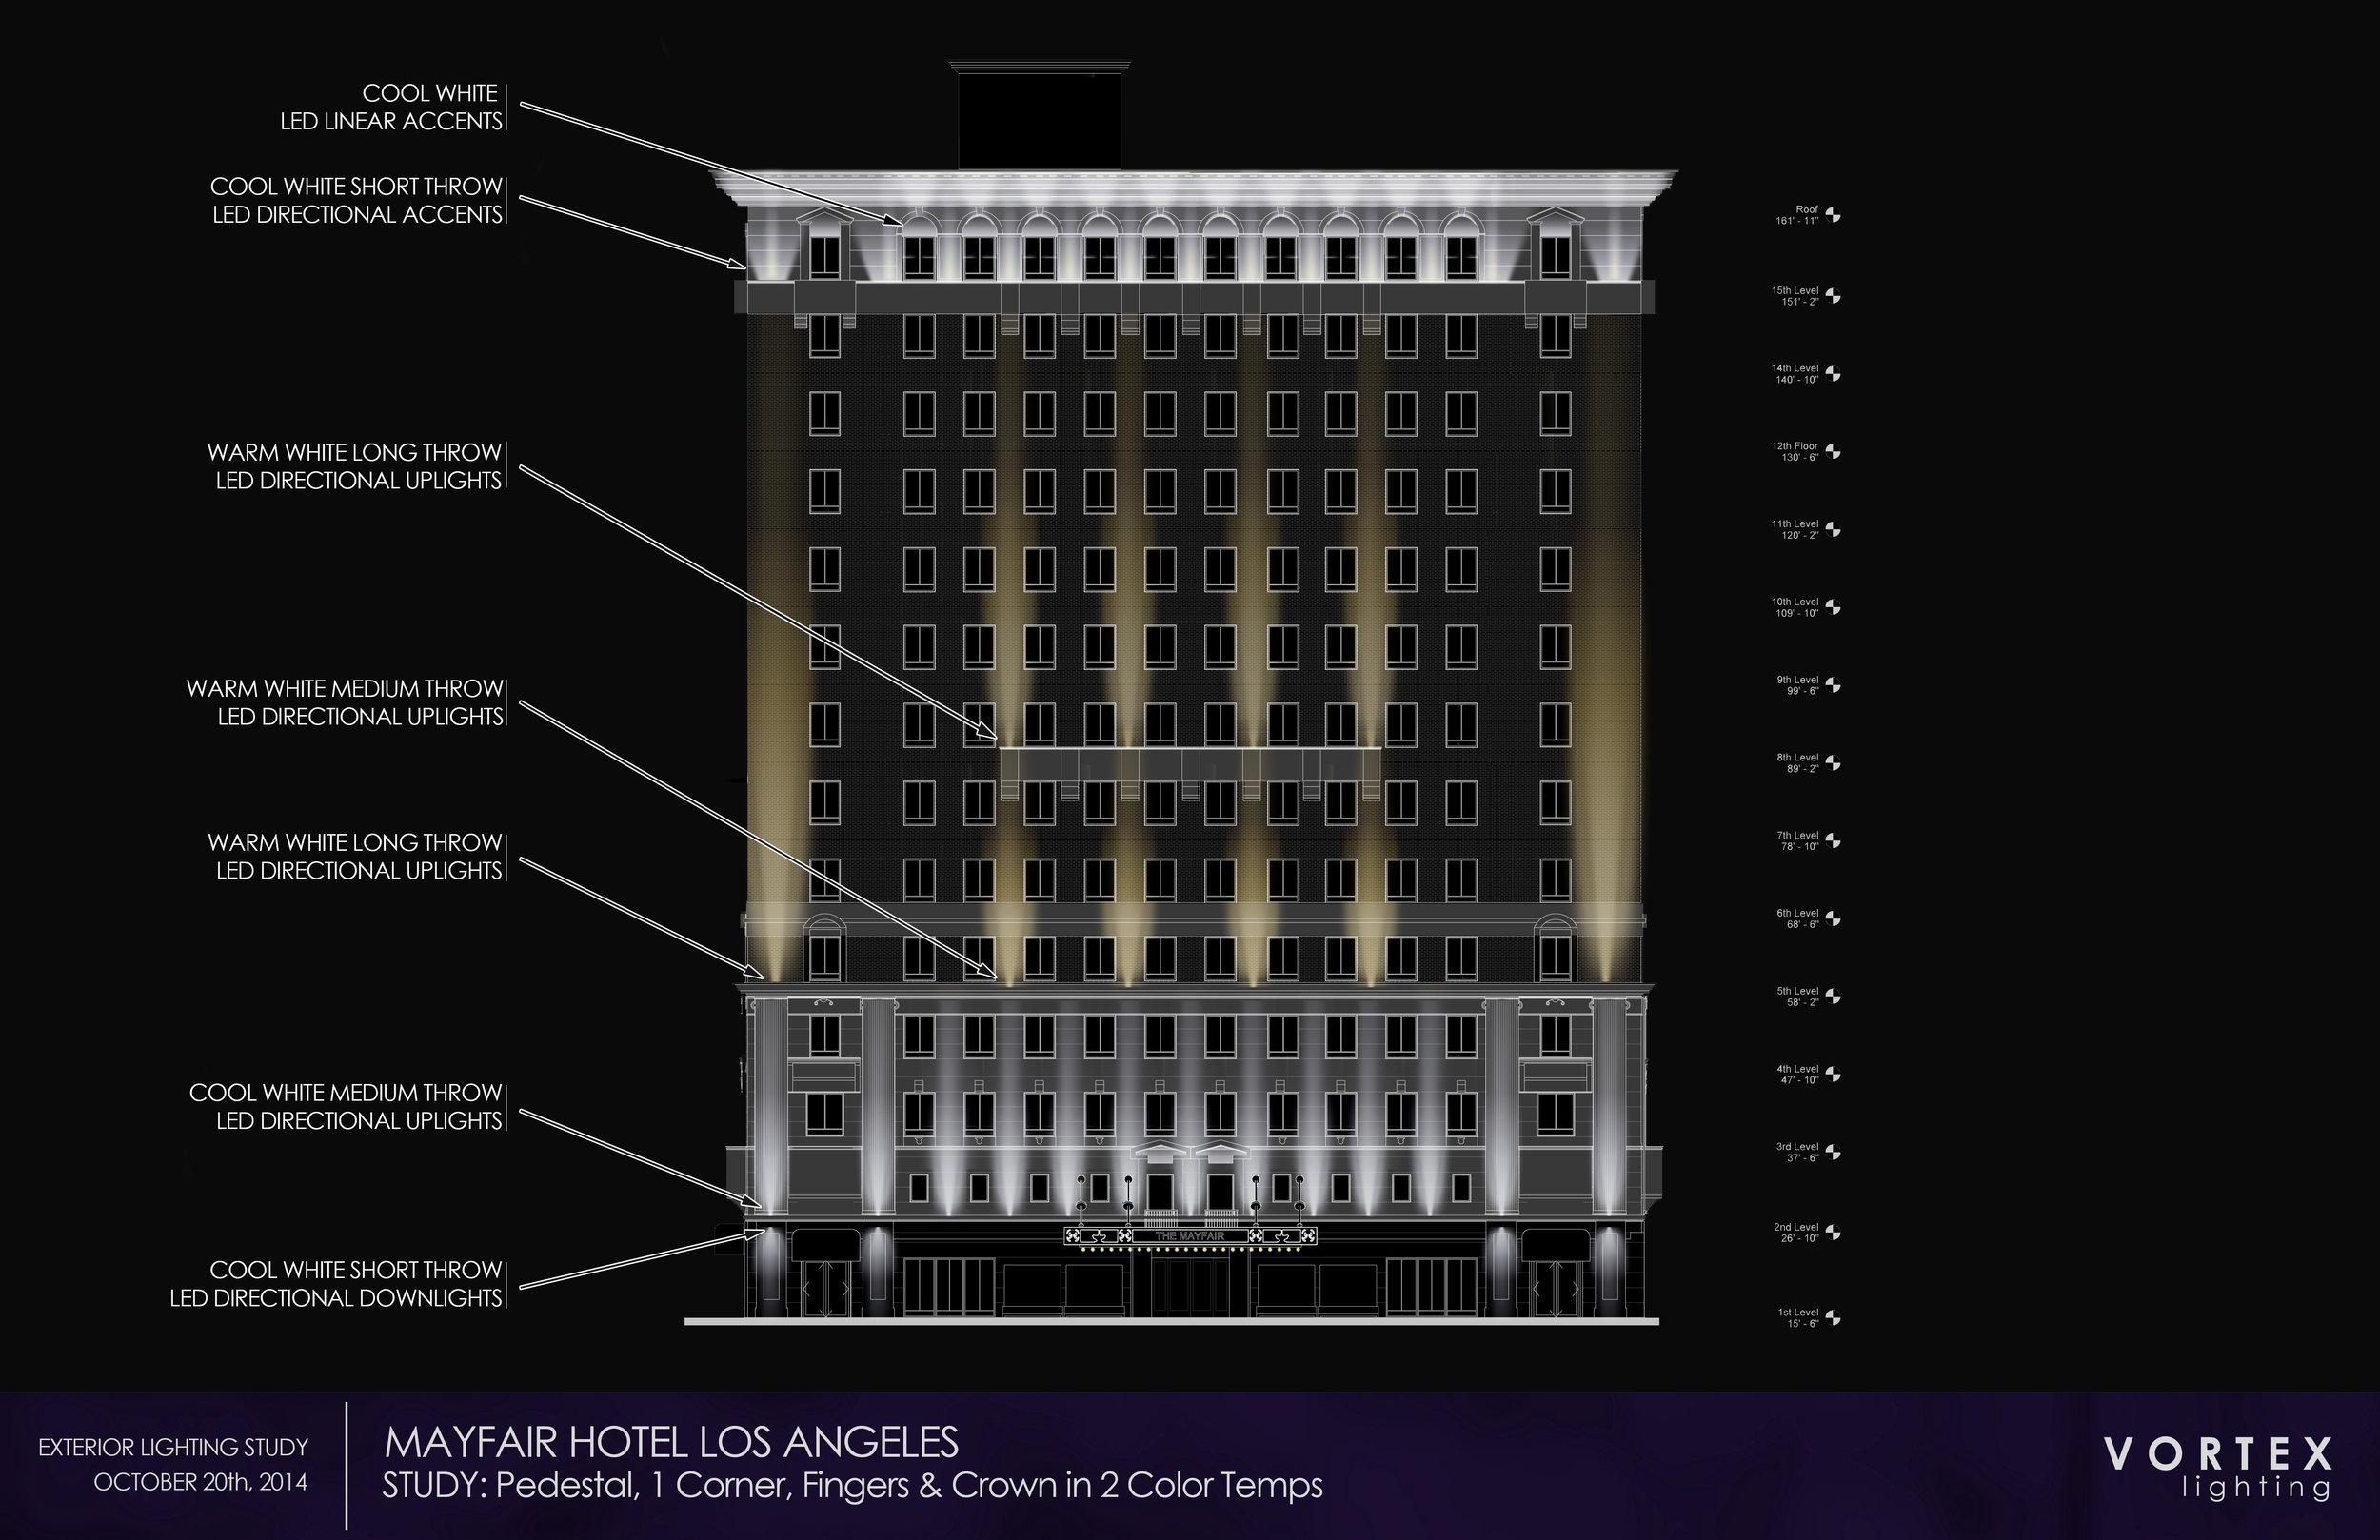 HISTORIC MAYFAIR HOTEL -